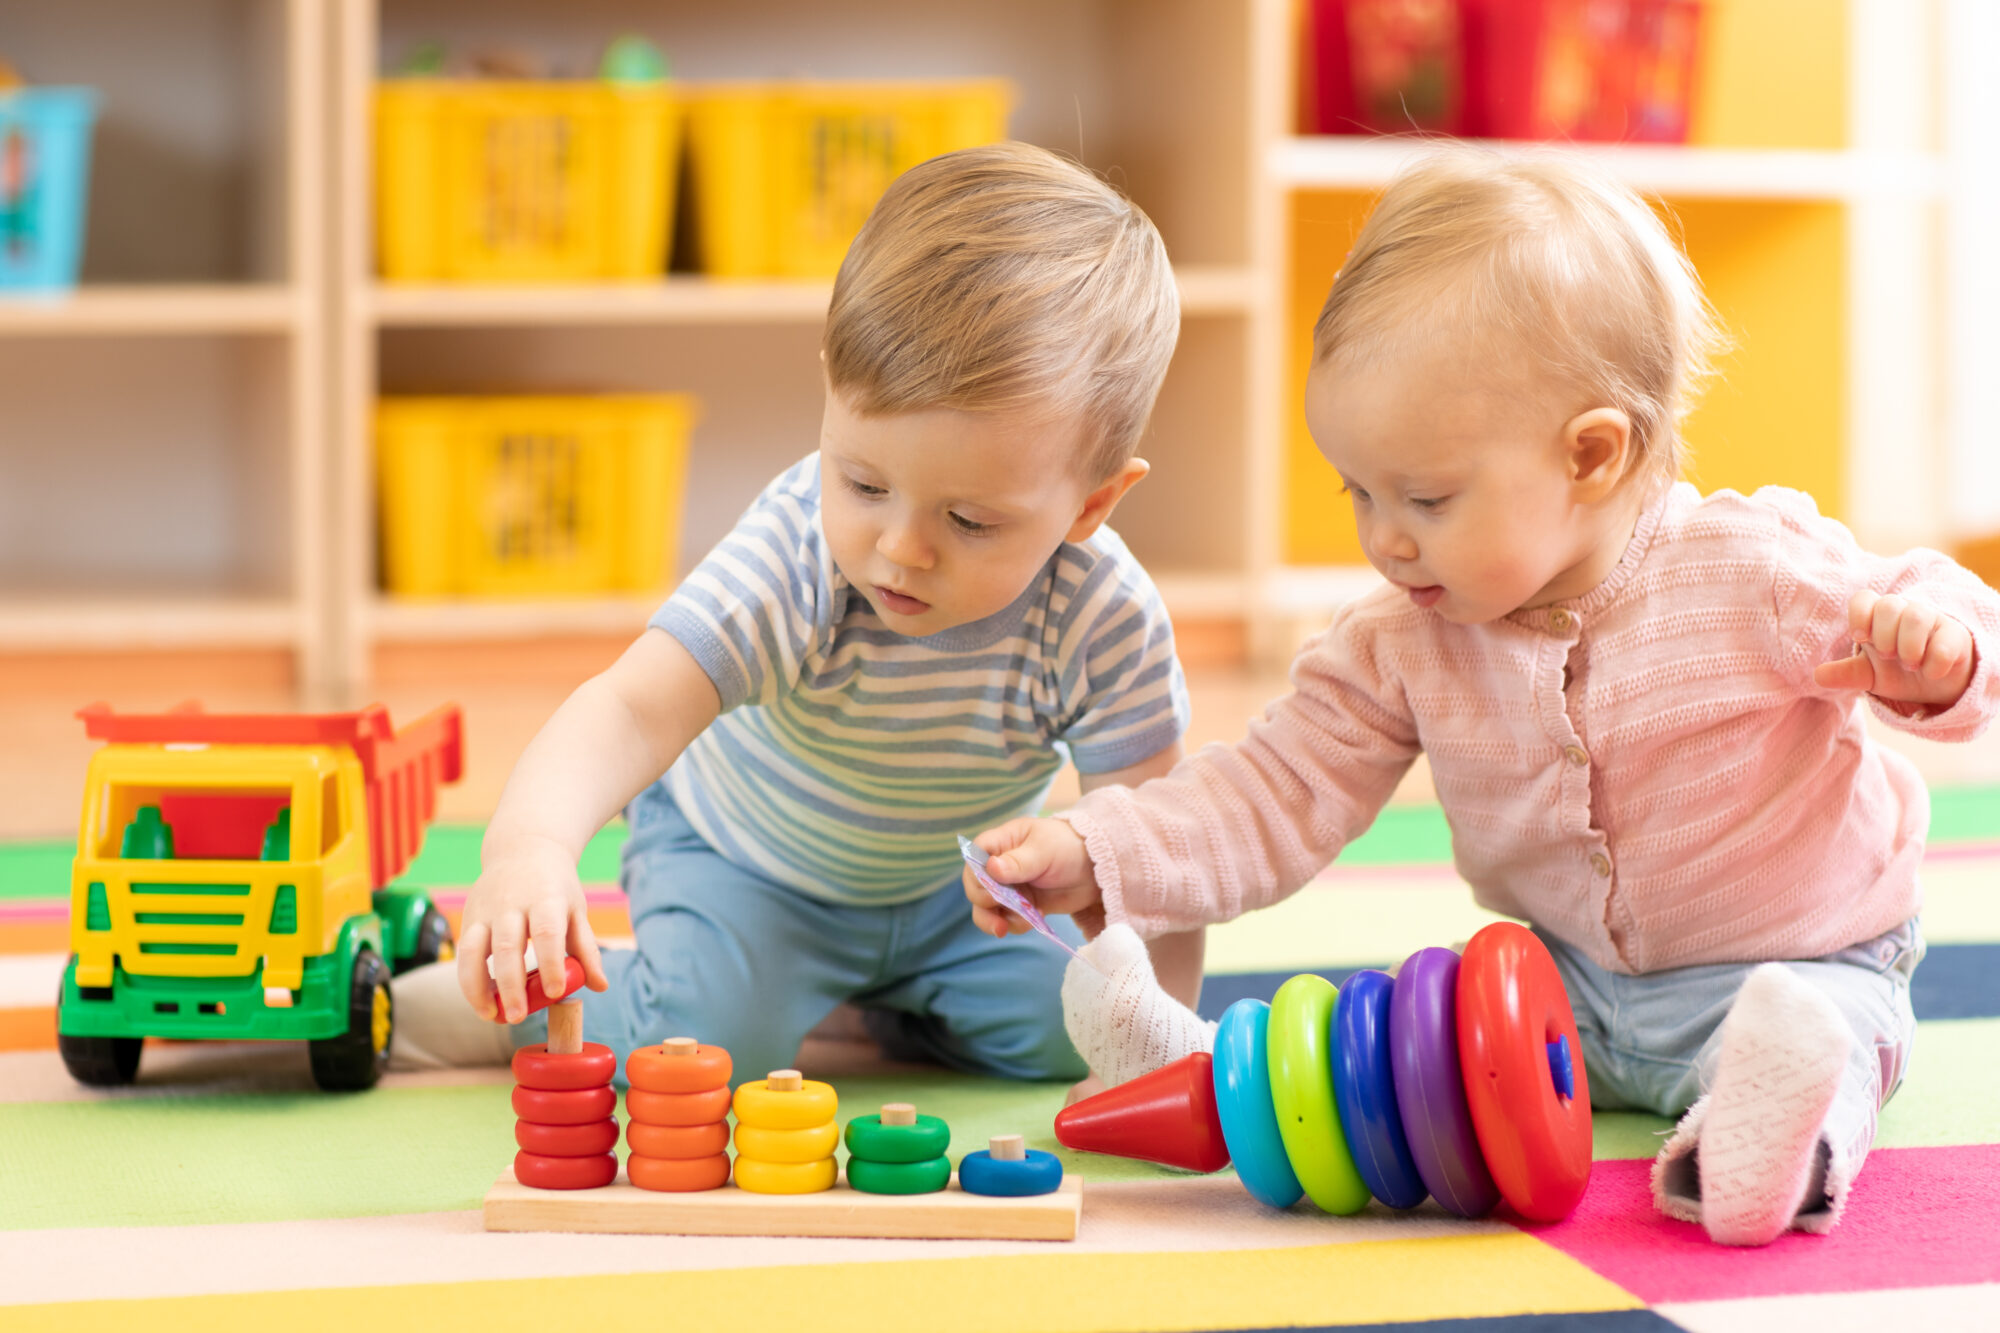 Nederlandse ouders zeer tevreden over kinderopvang